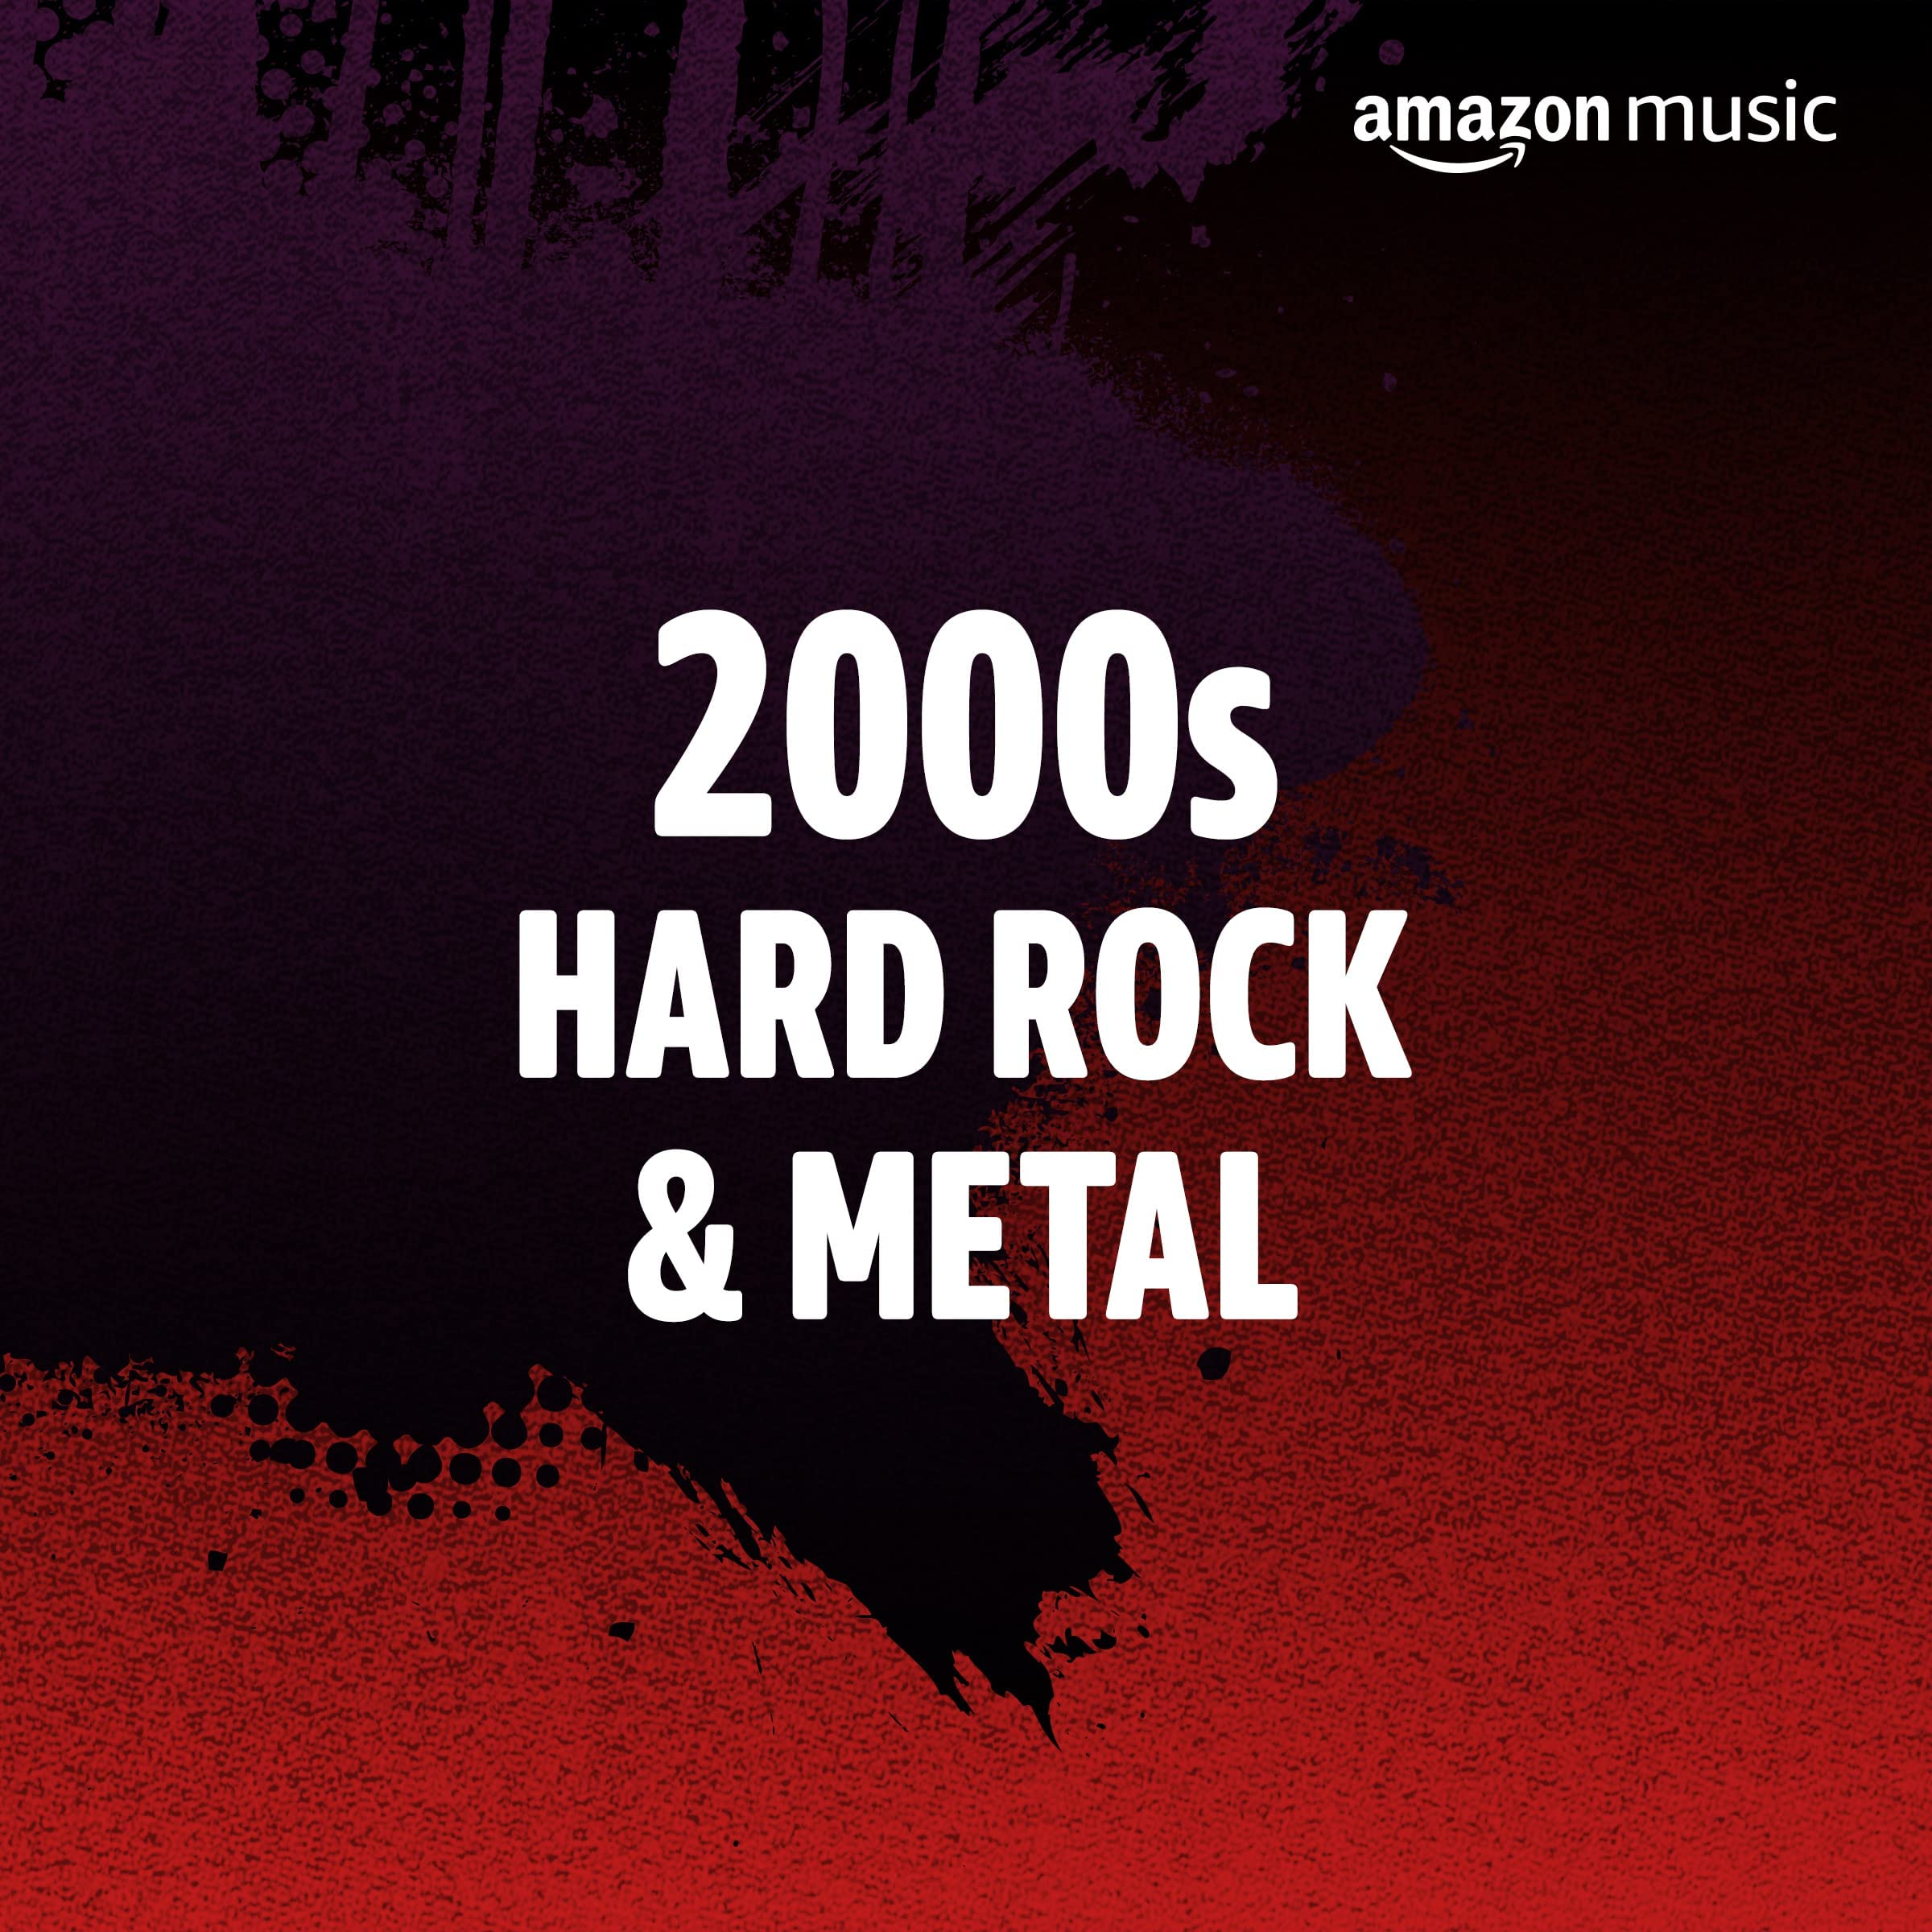 00s Hard Rock & Metal